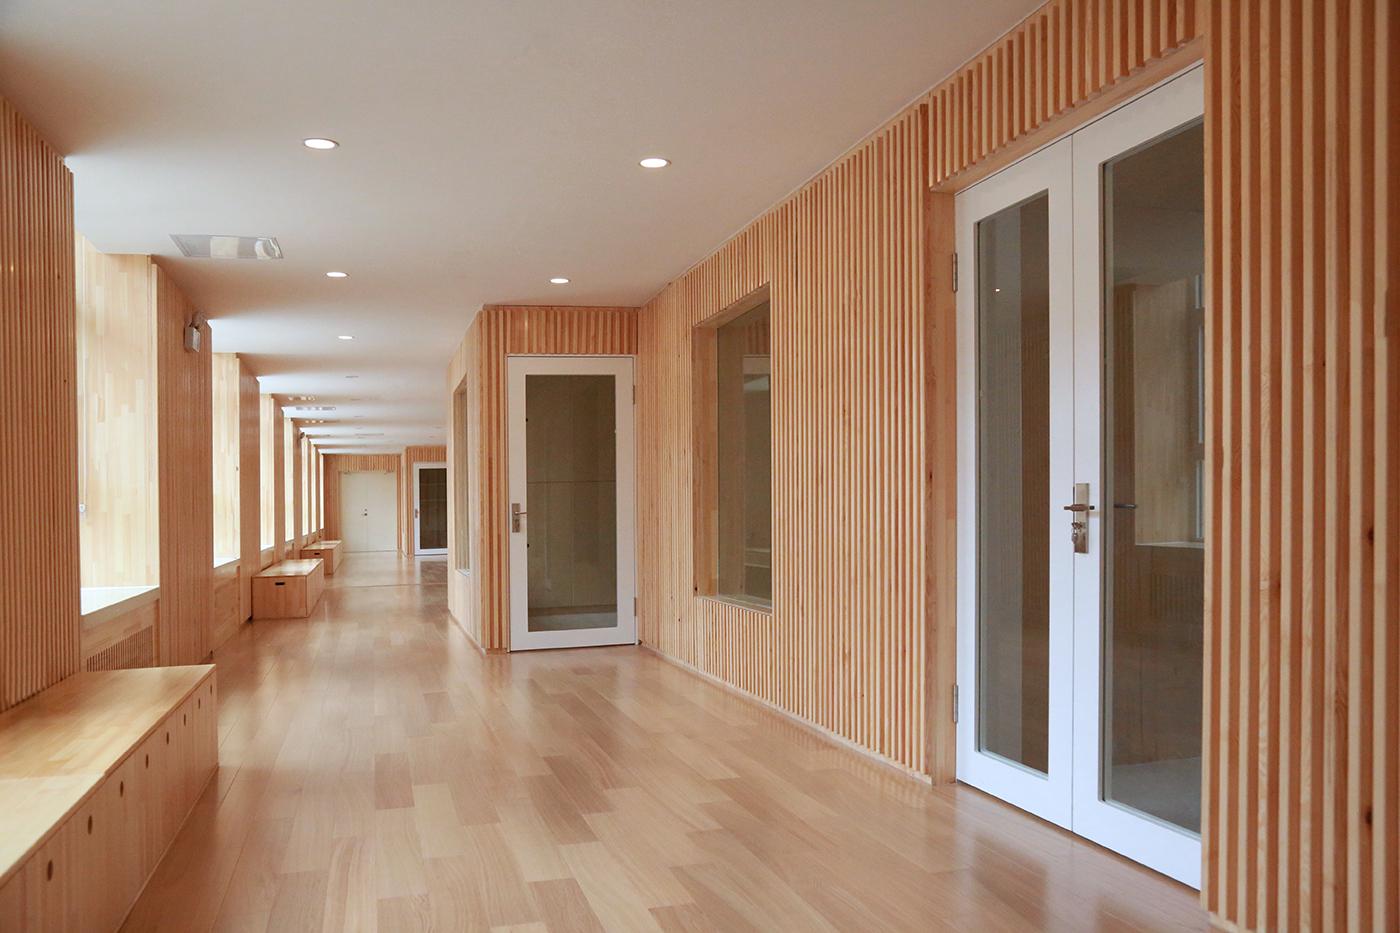 Corridor_lores.jpg